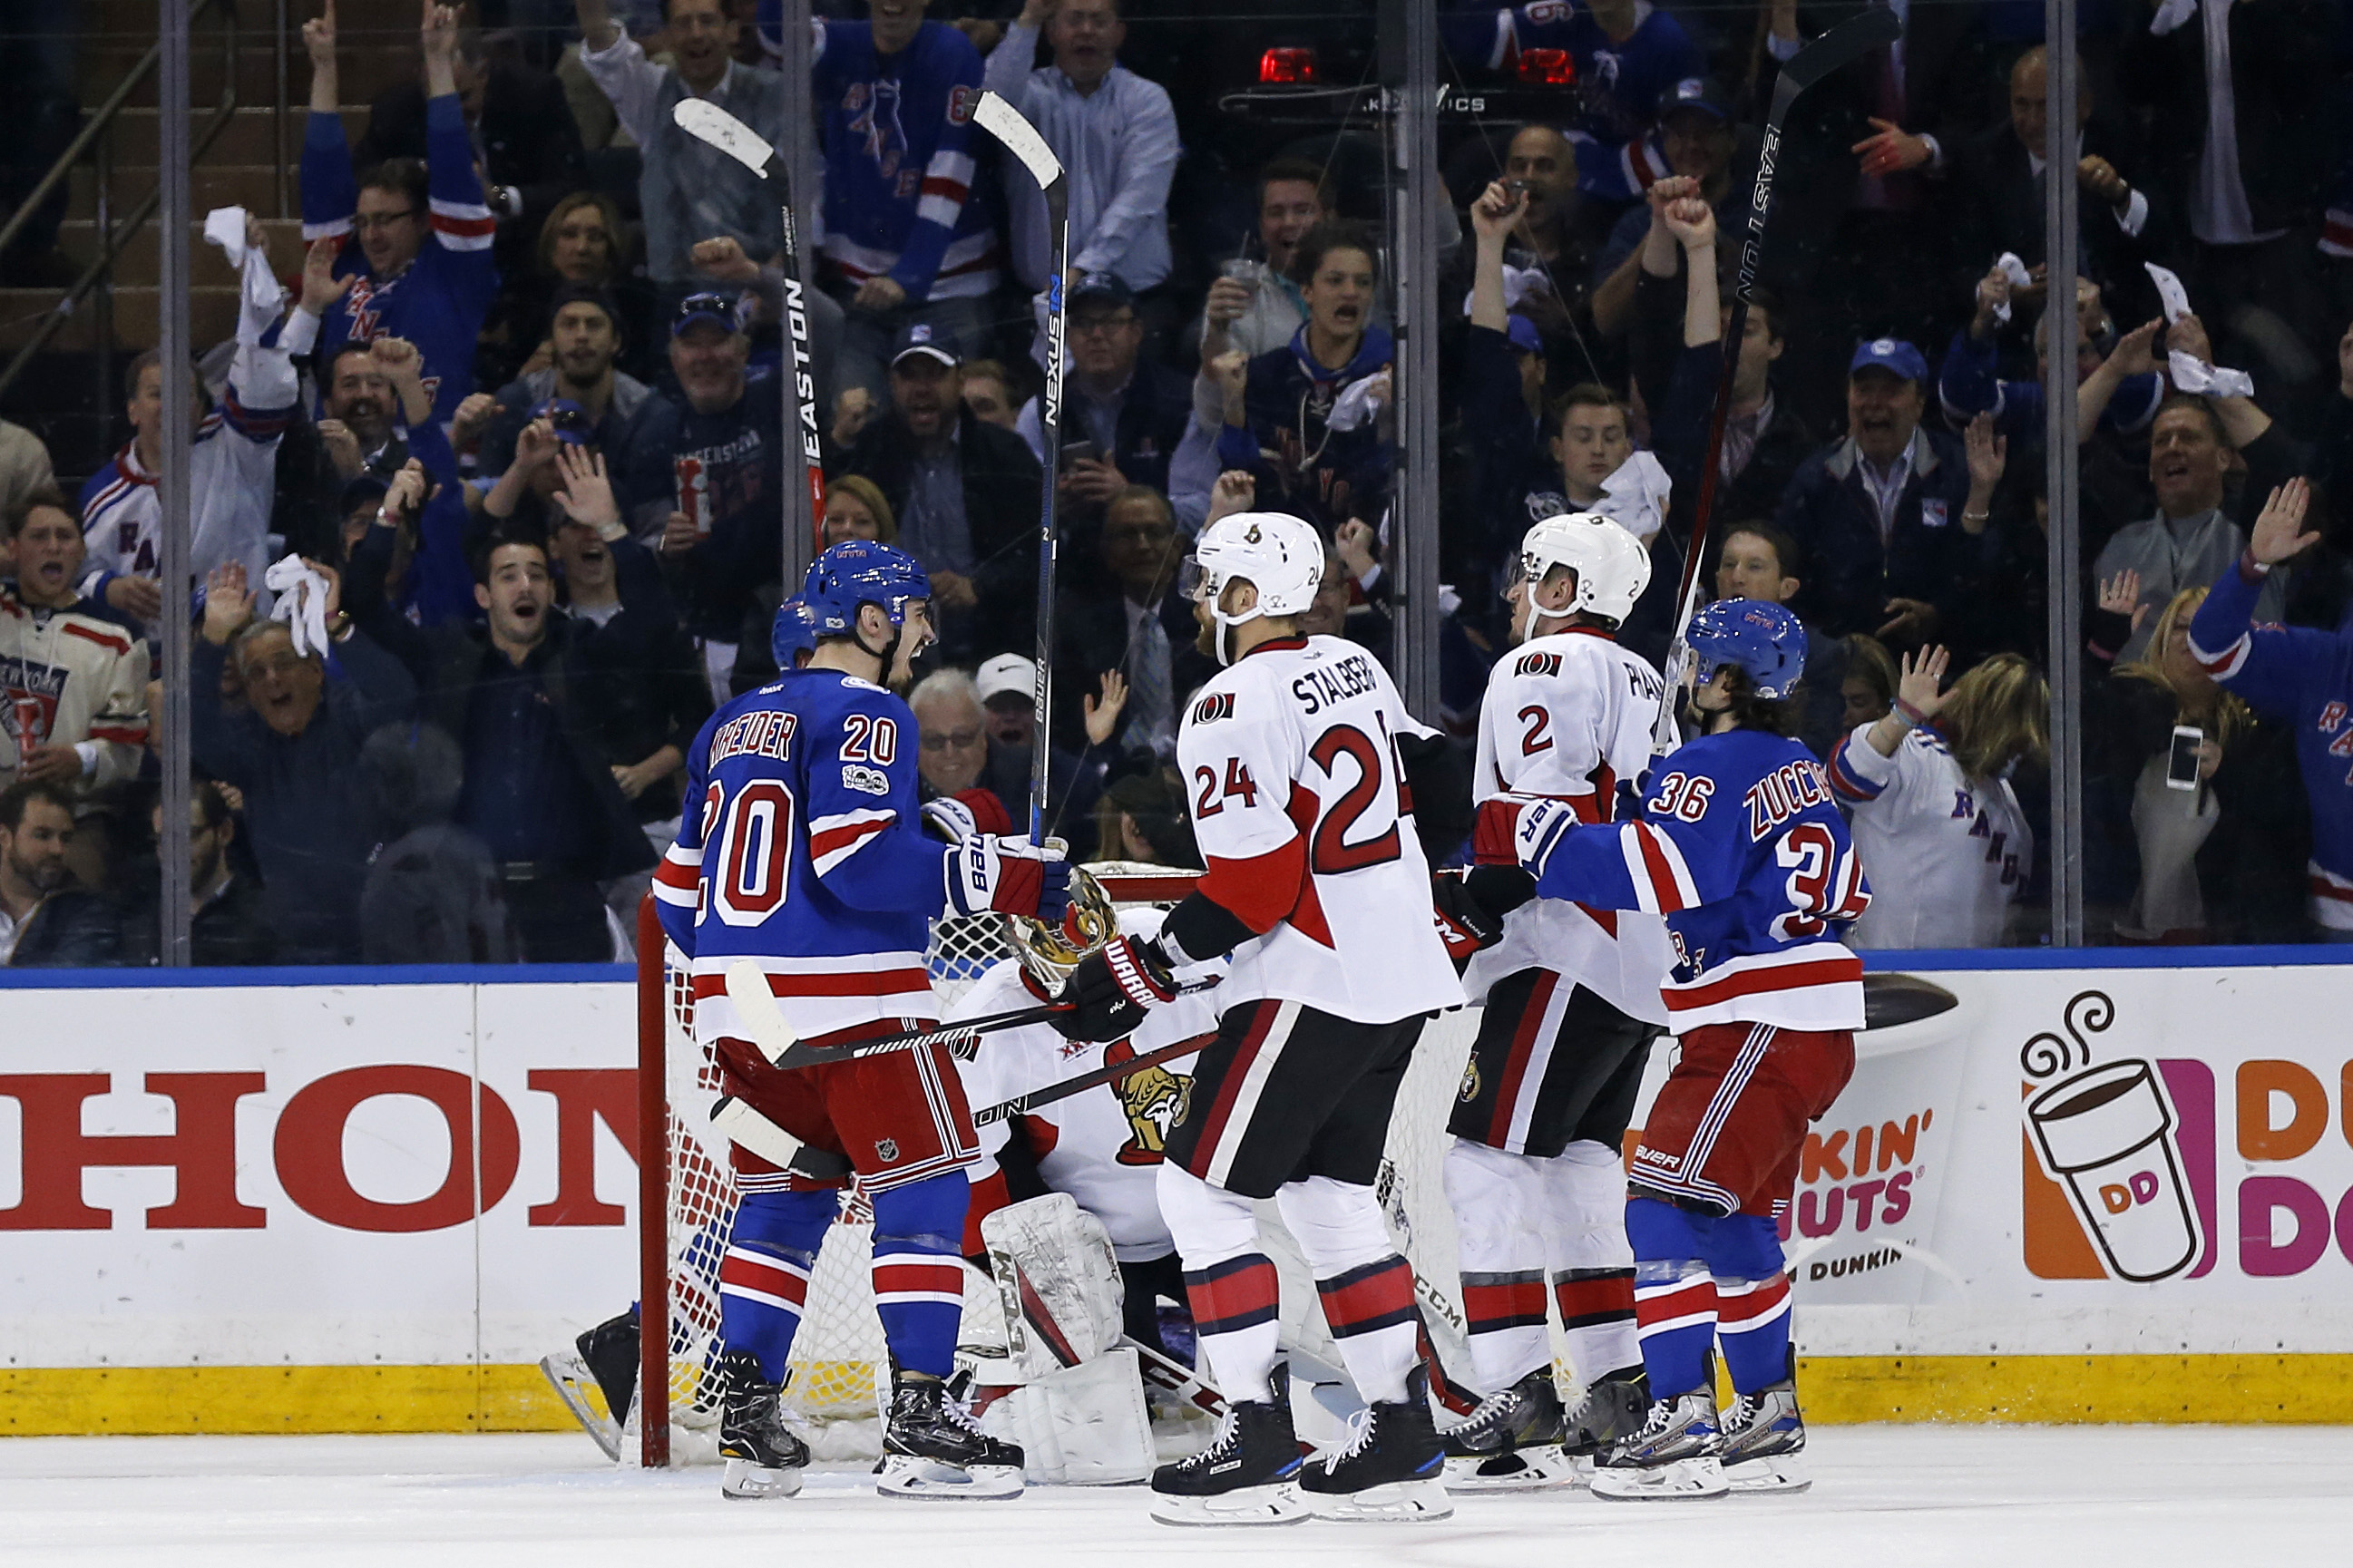 New York Islanders Vs Rangers Live Stream